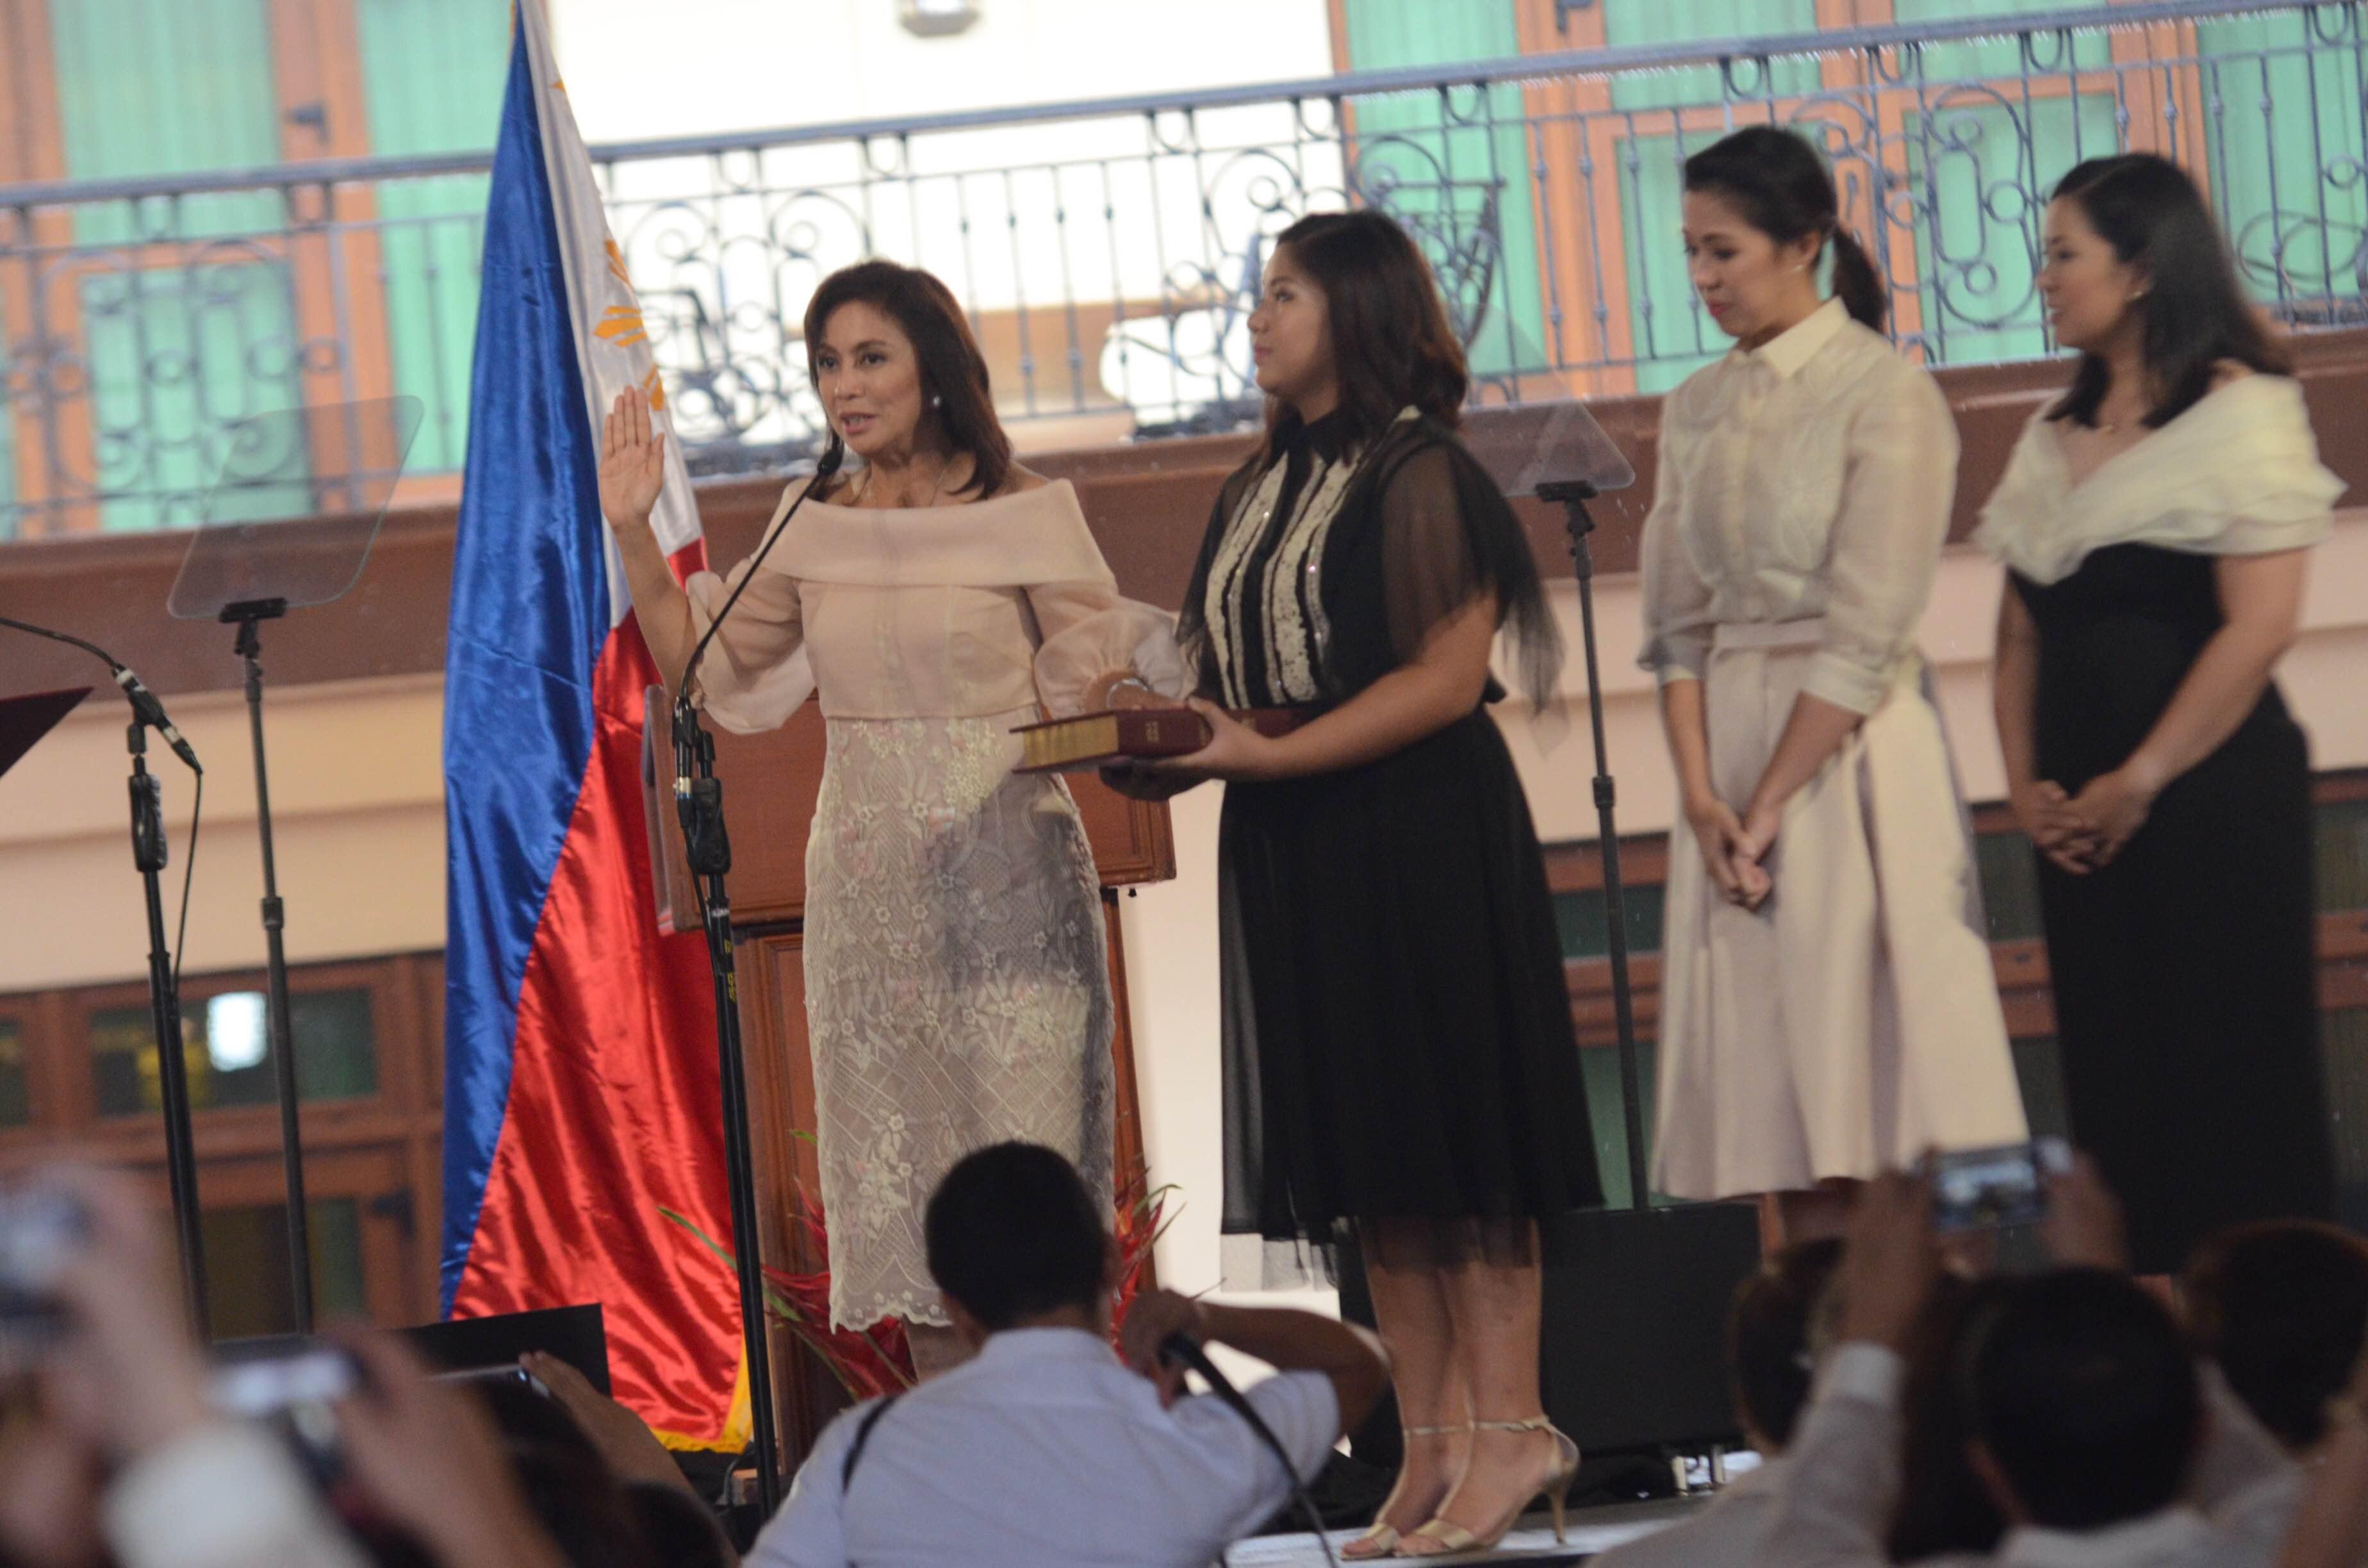 NEW VP. Vice President Leni Robredo takes her oath beside 3 daughters (from left) Jillian, Aika, Tricia. Screen shot from Rappler